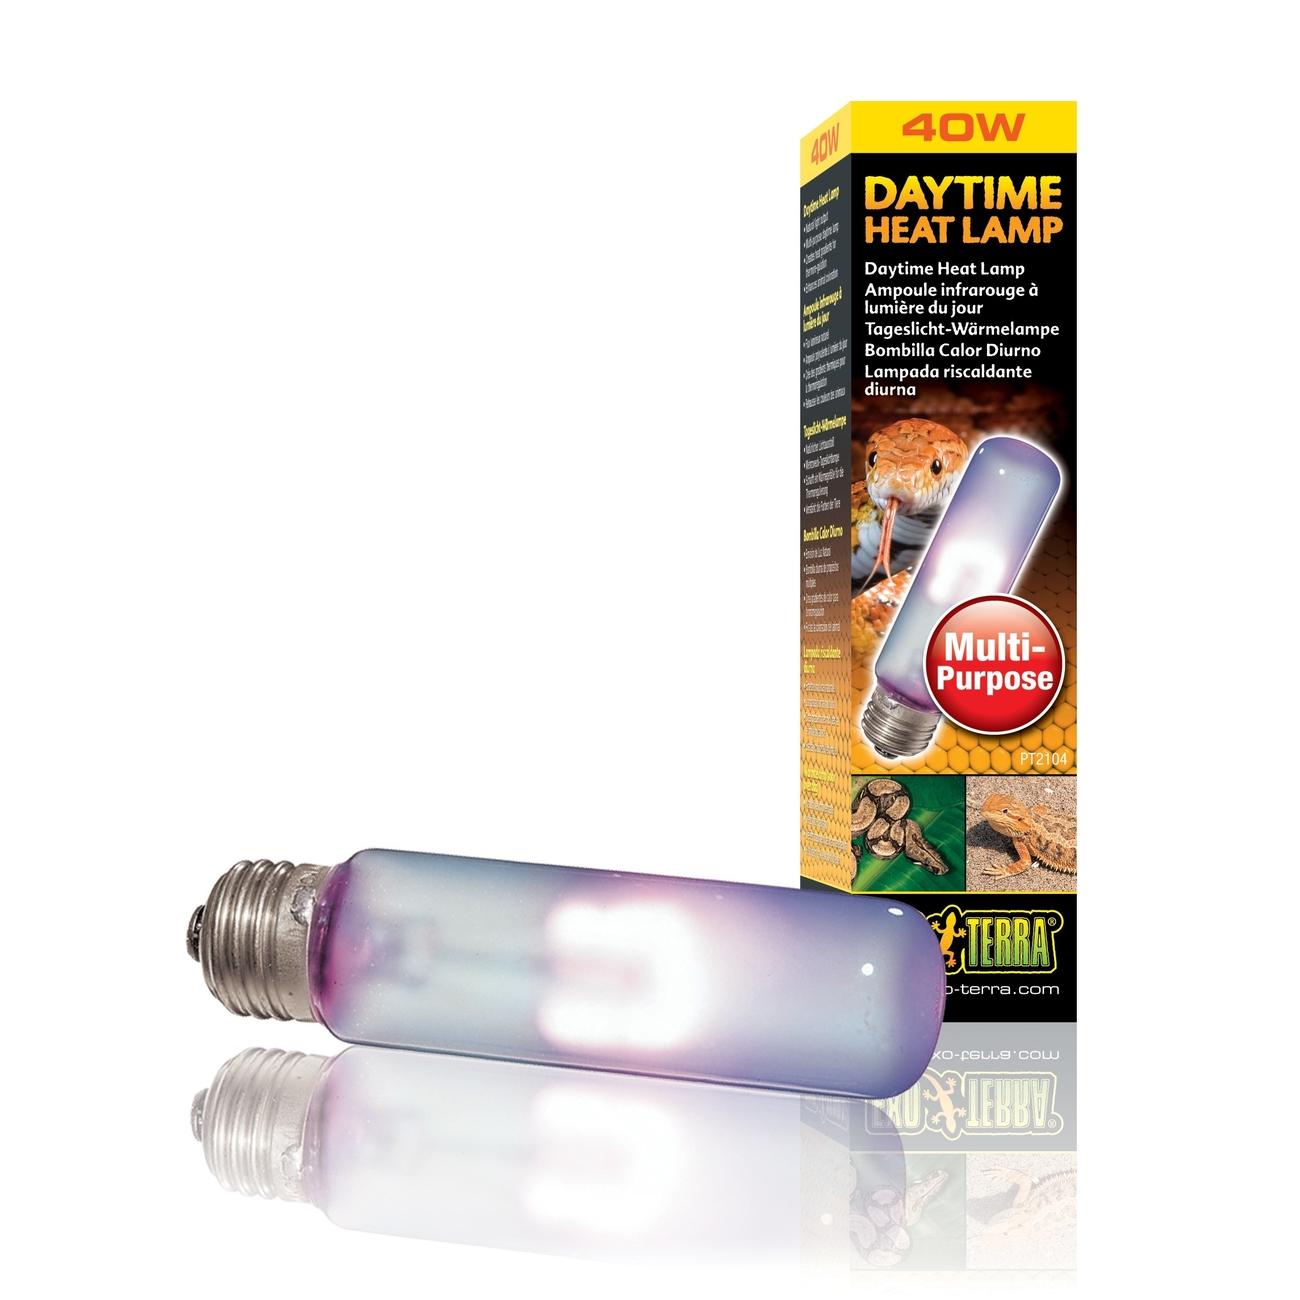 Exo Terra - Daytime Heat Lampe Bild 5